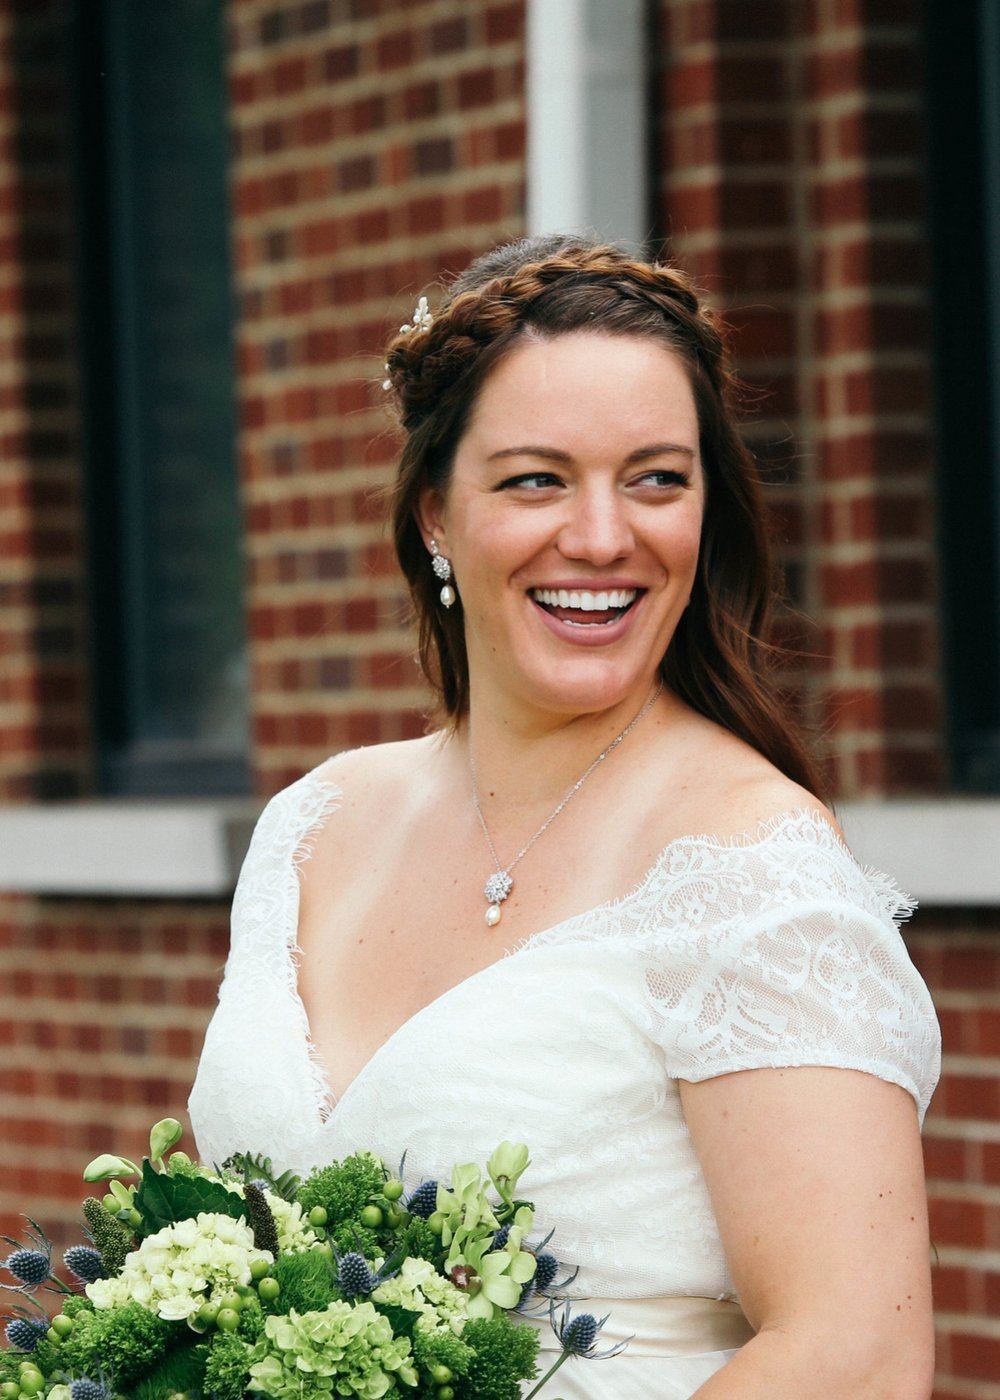 Bridal portrait by Gretchen Bell, Louisville, KY